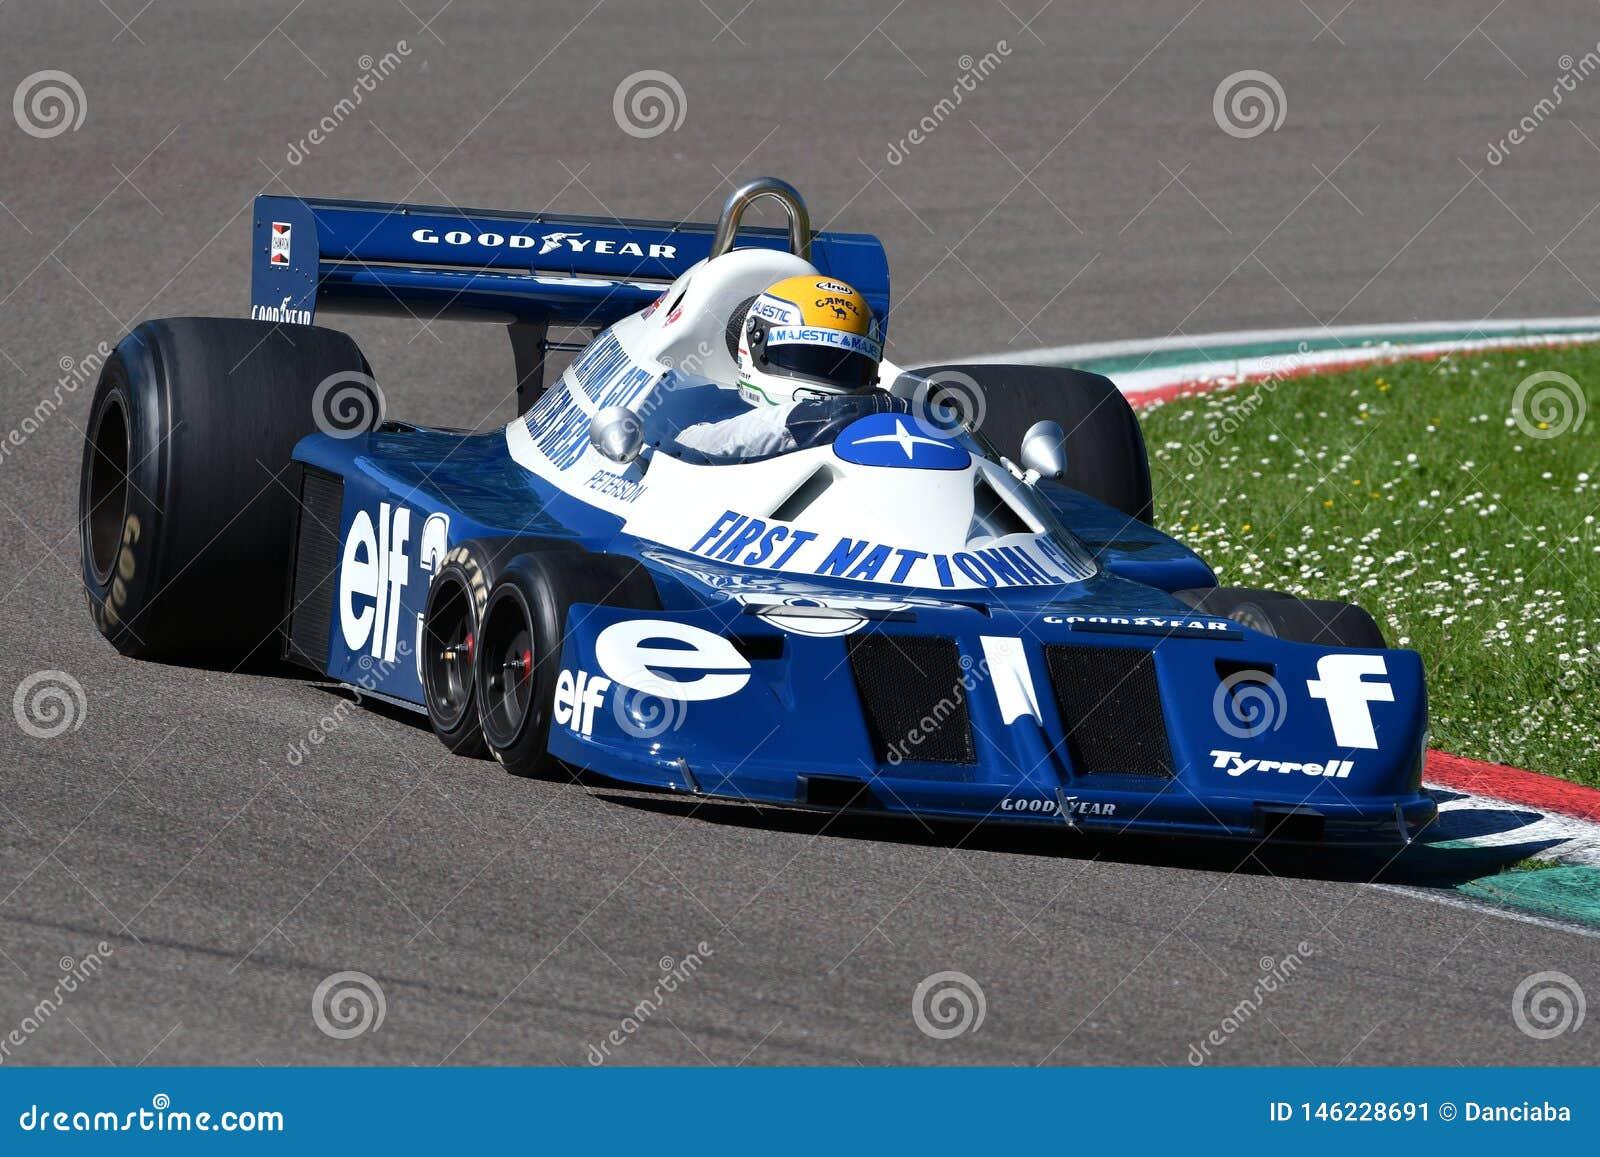 Imola, 27 April 2019: Historic 1976 F1 Tyrrell P34 ex Ronnie Peterson driven by Pierluigi Martini in action